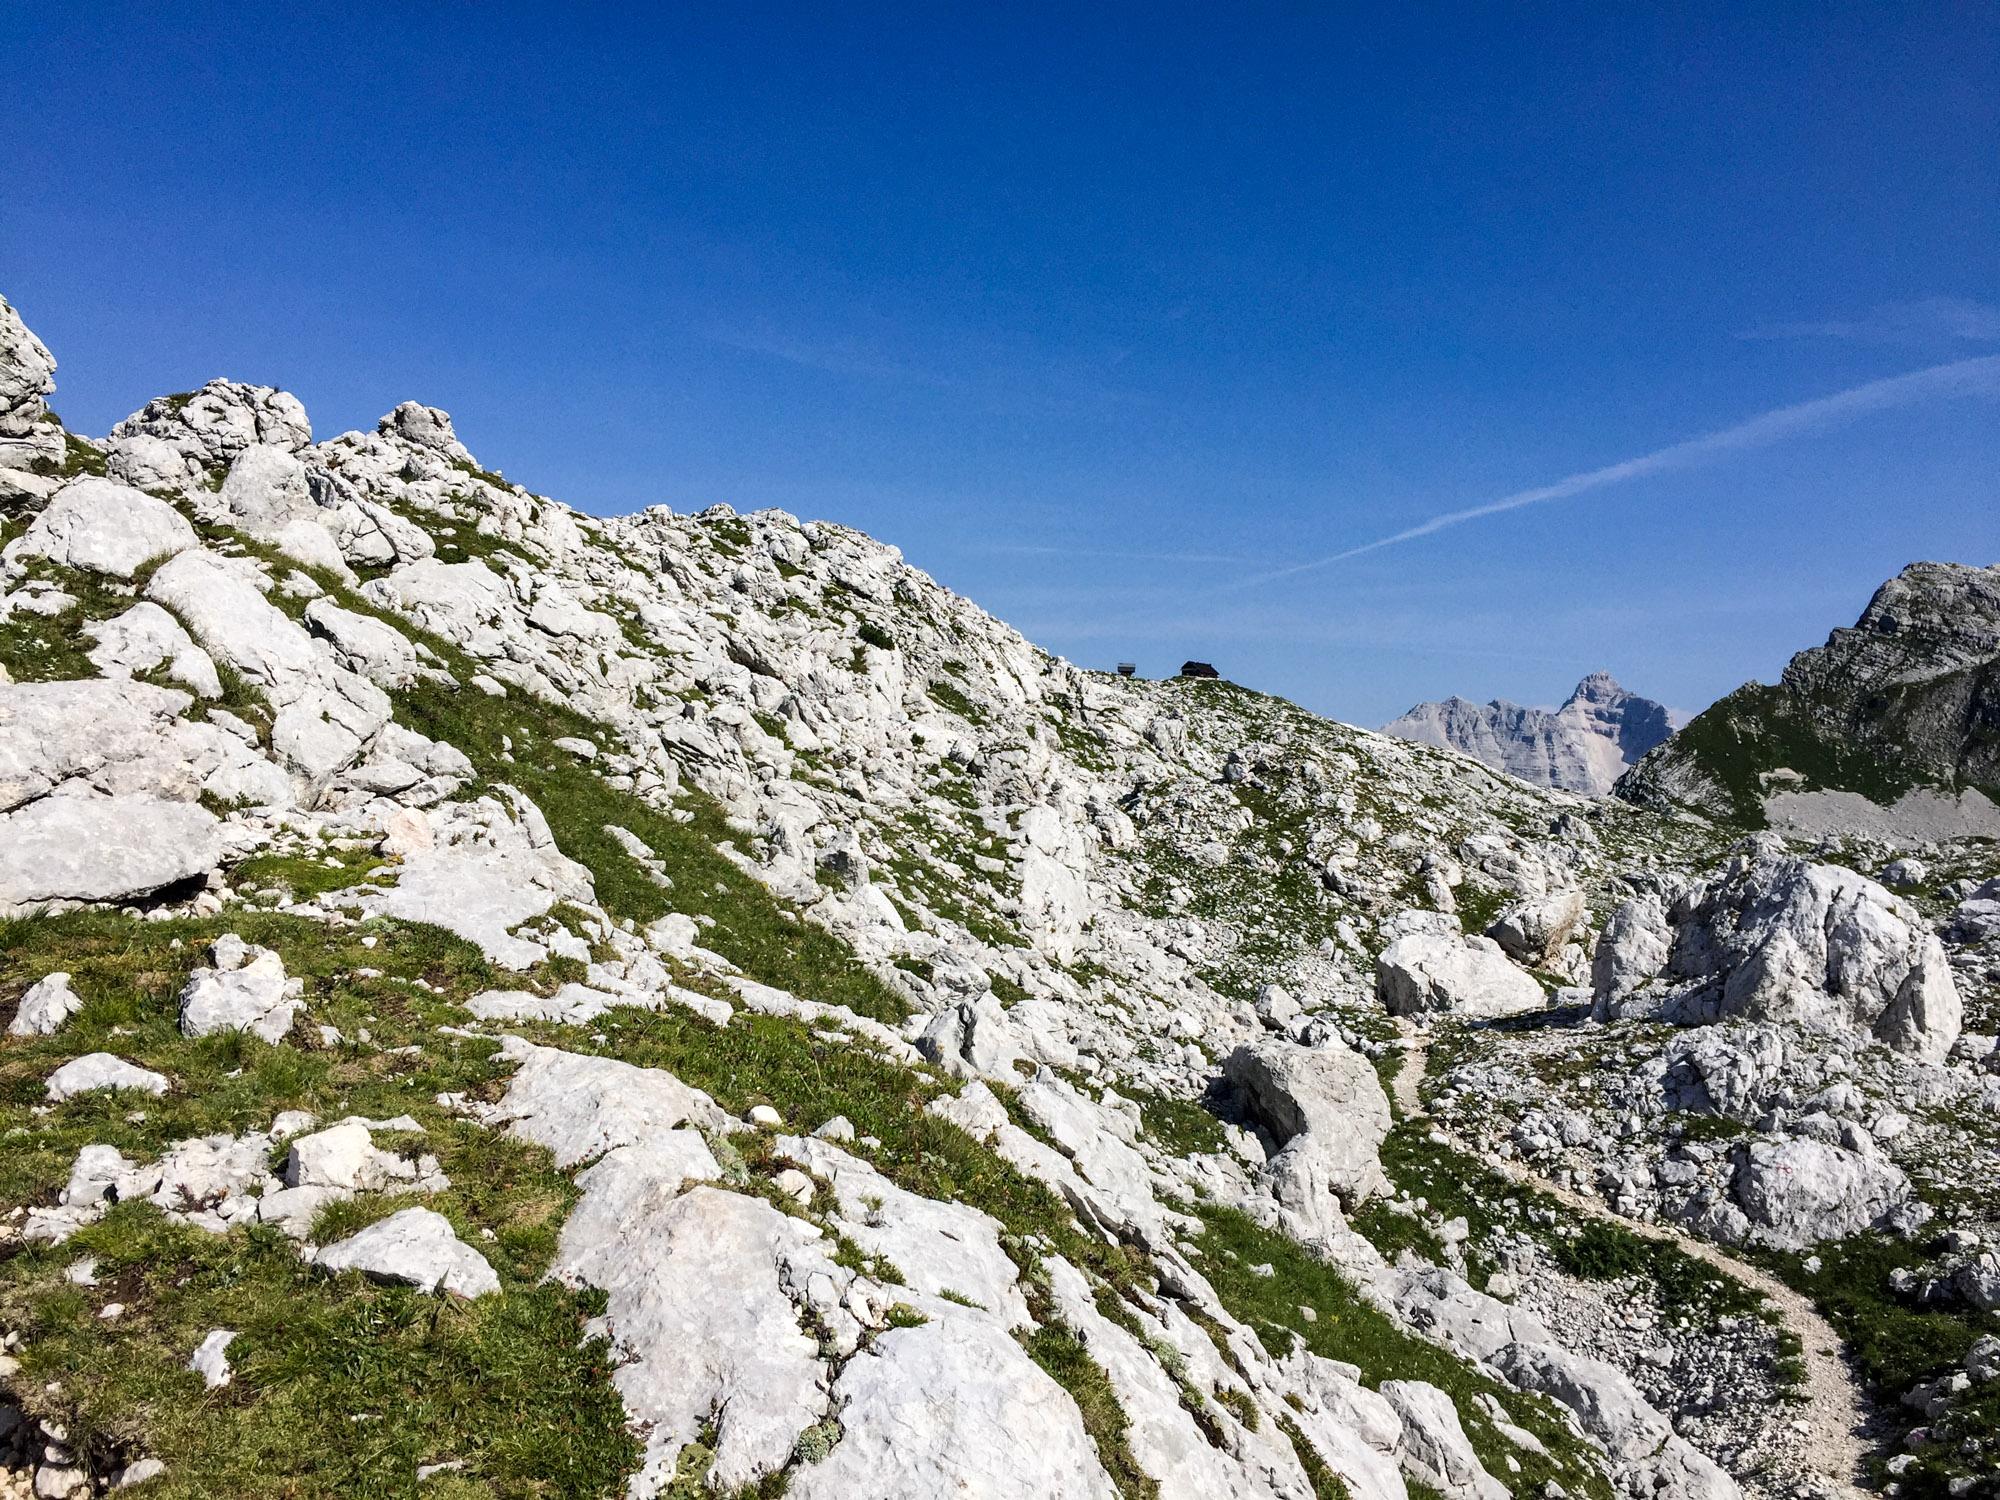 Zasavska Koca refuge (at the top of the trail)